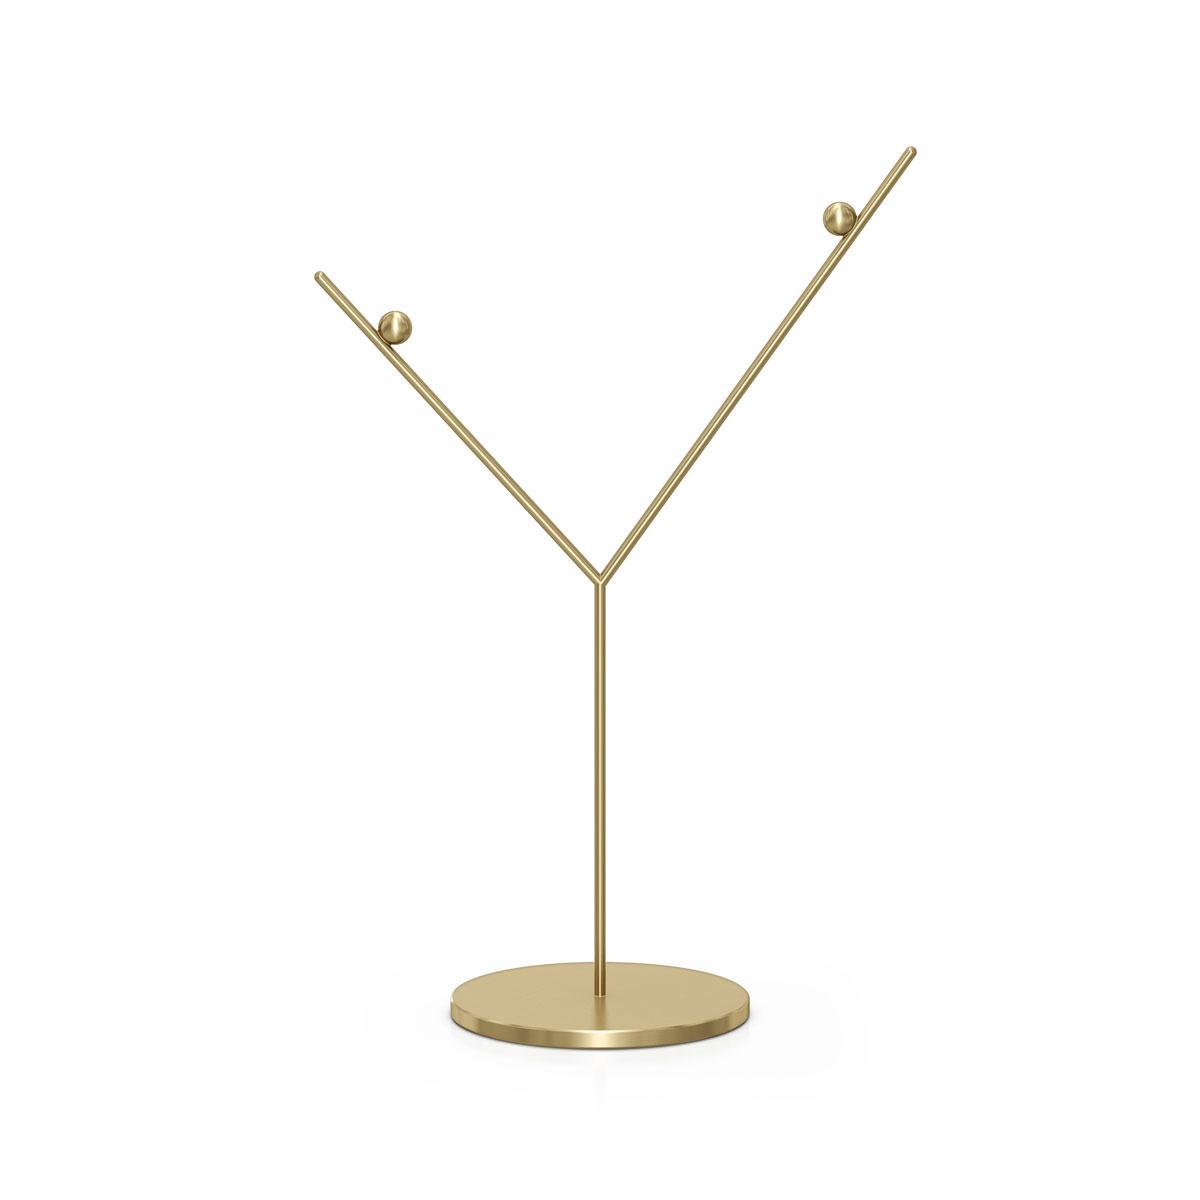 Swarovski Display Ornament Stand Gold Tone